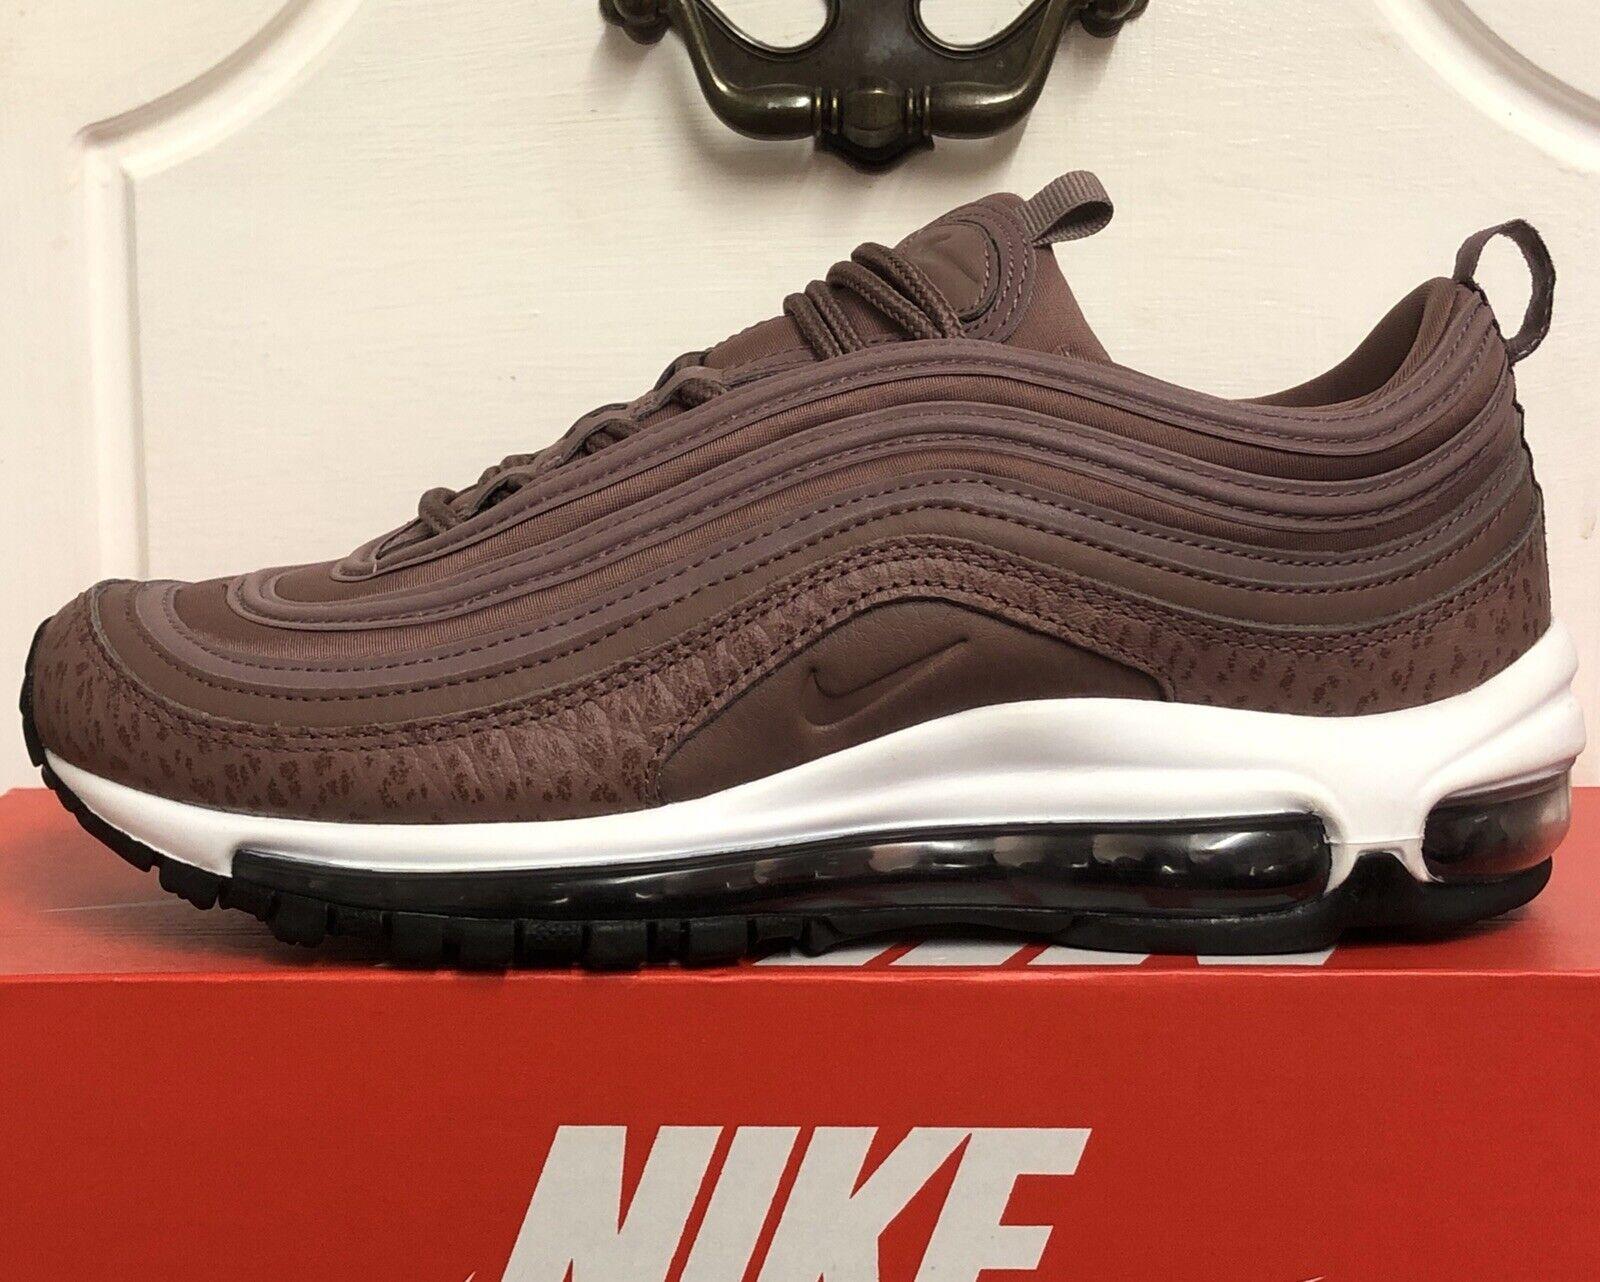 NIKE AIR MAX 97 LEA TRAINERS zapatillas zapatos Talla UK 6,5 EUR 40,5 US 9